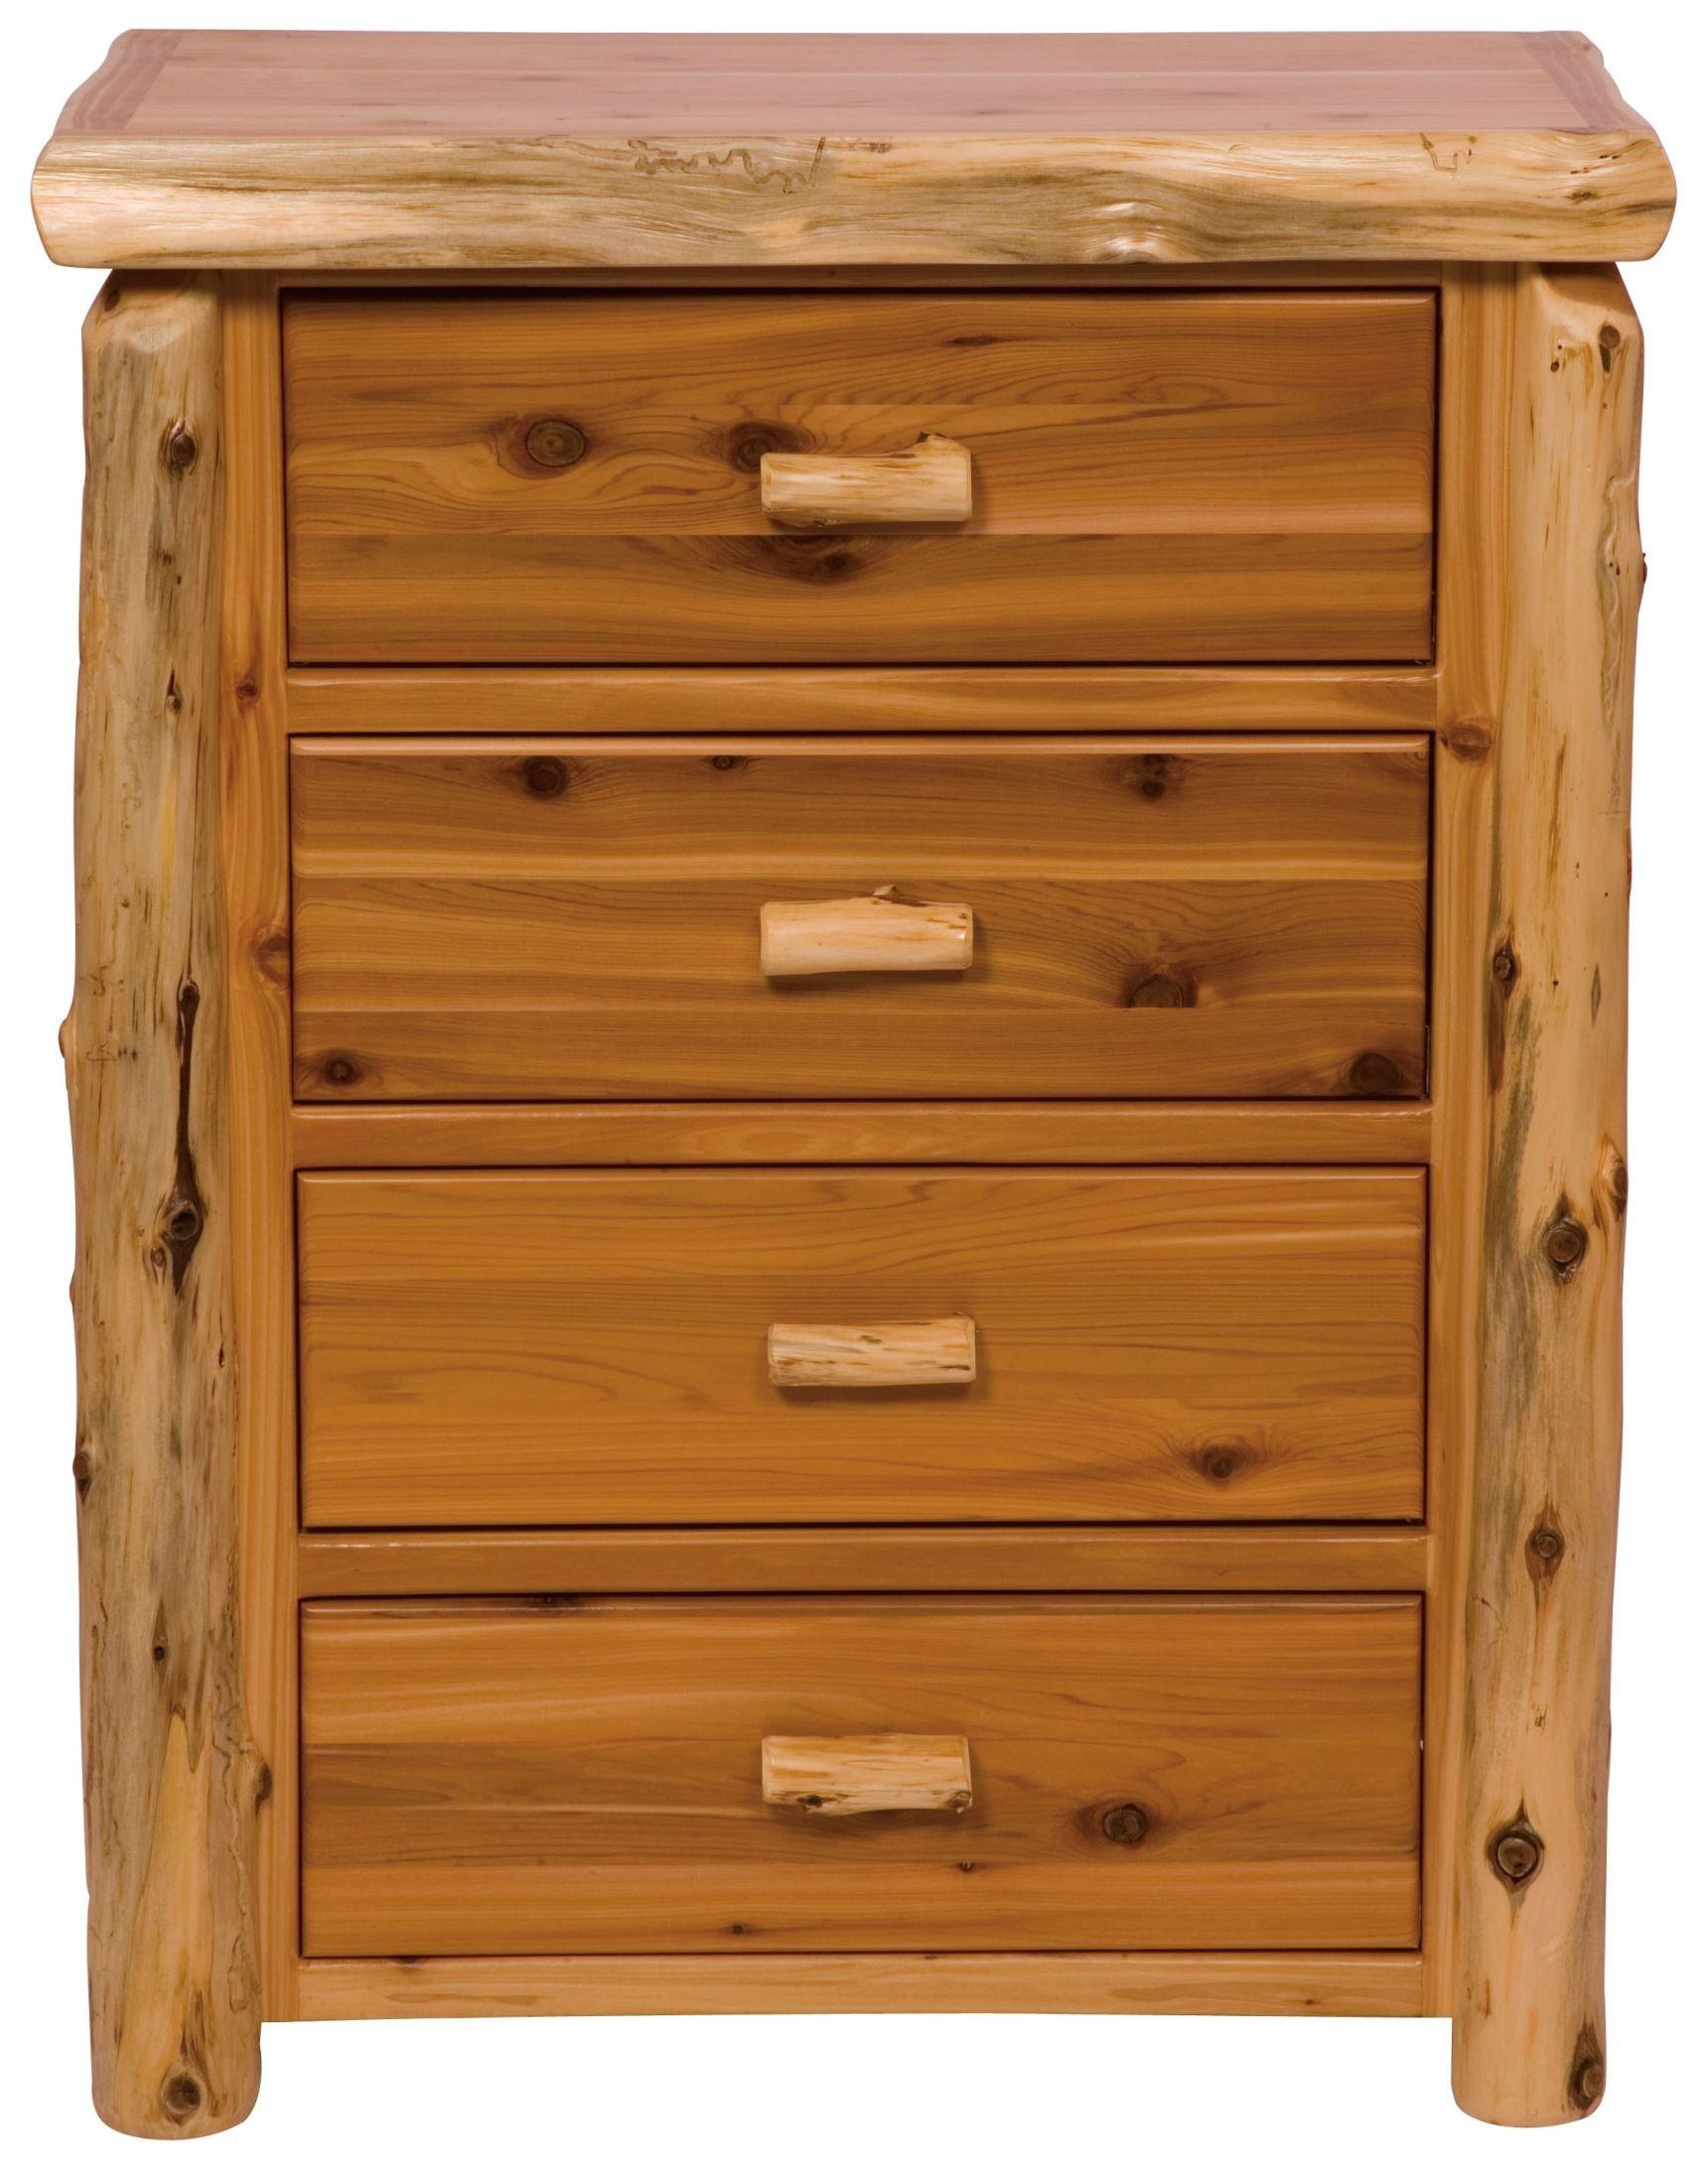 Traditional cedar canopy bedroom set from fireside lodge 10060 coleman furniture - Cedar bedroom furniture ...